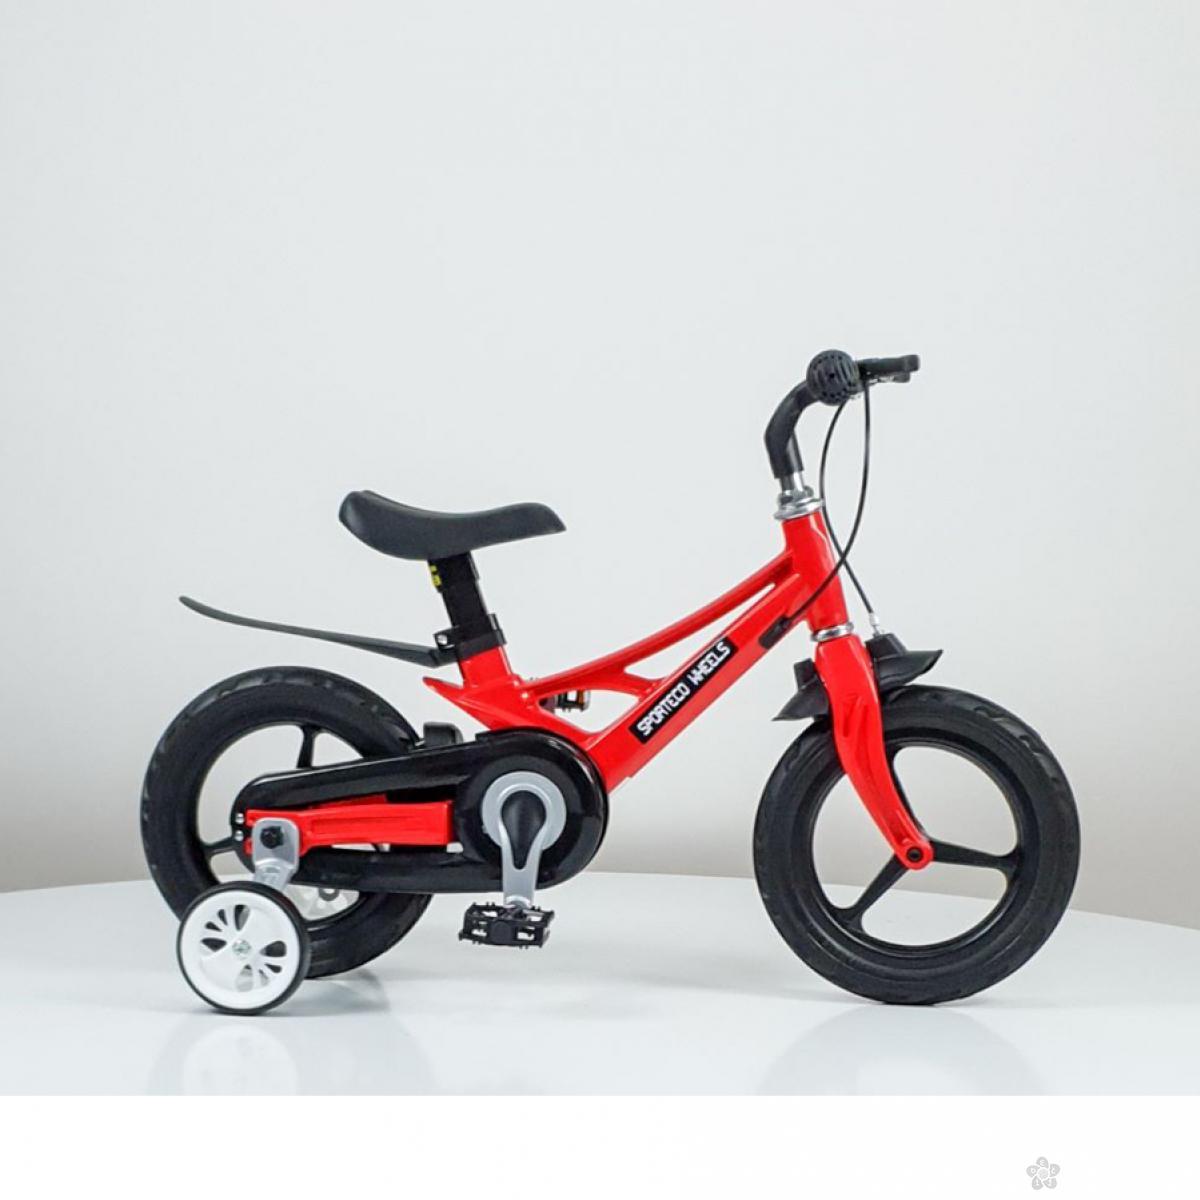 Bicikl Sporteco model 717-12 crveni